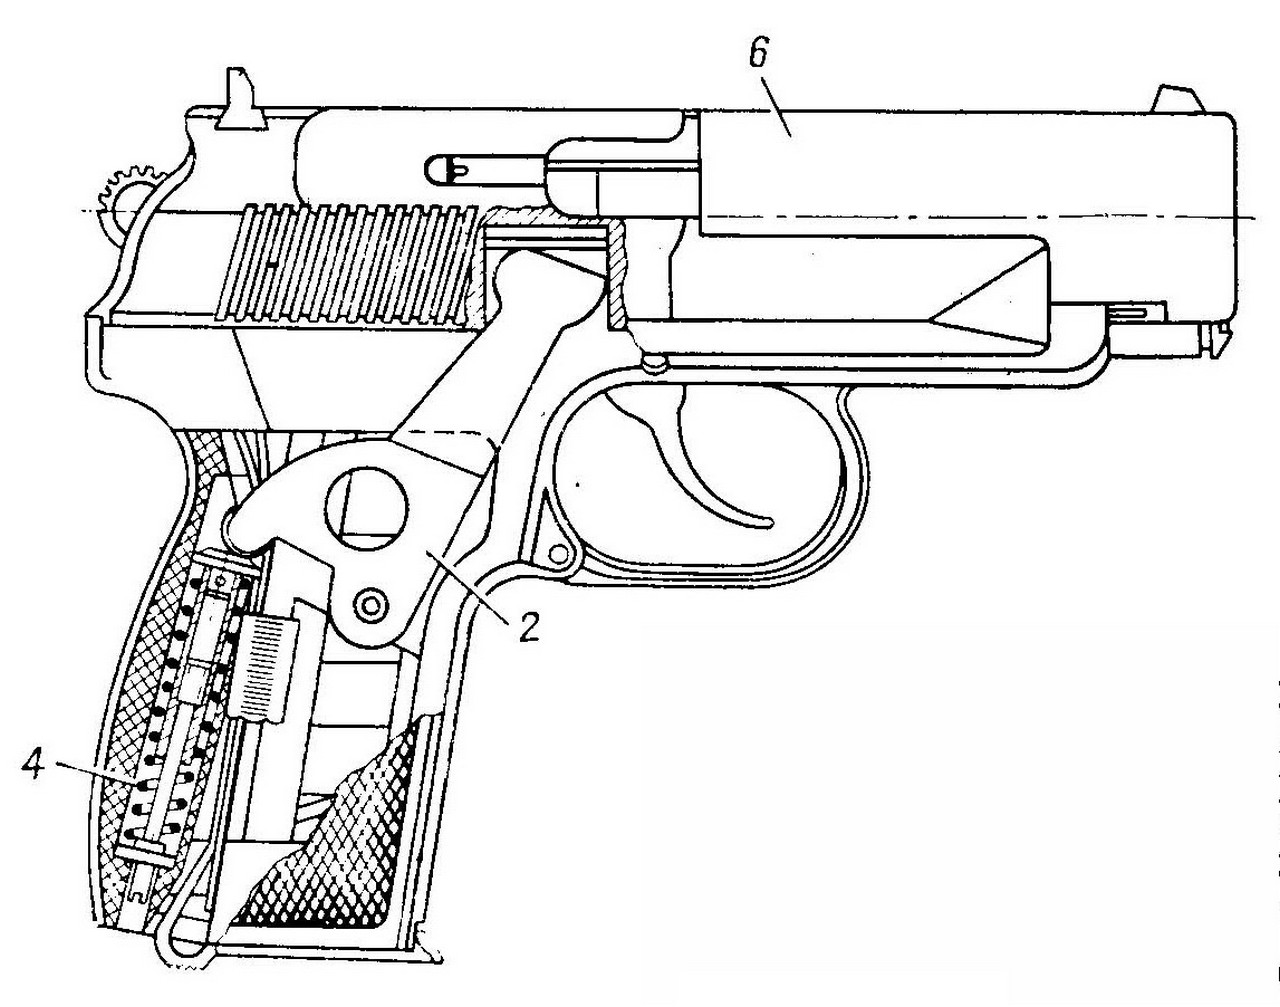 9mm Bullet Drawing At Getdrawings